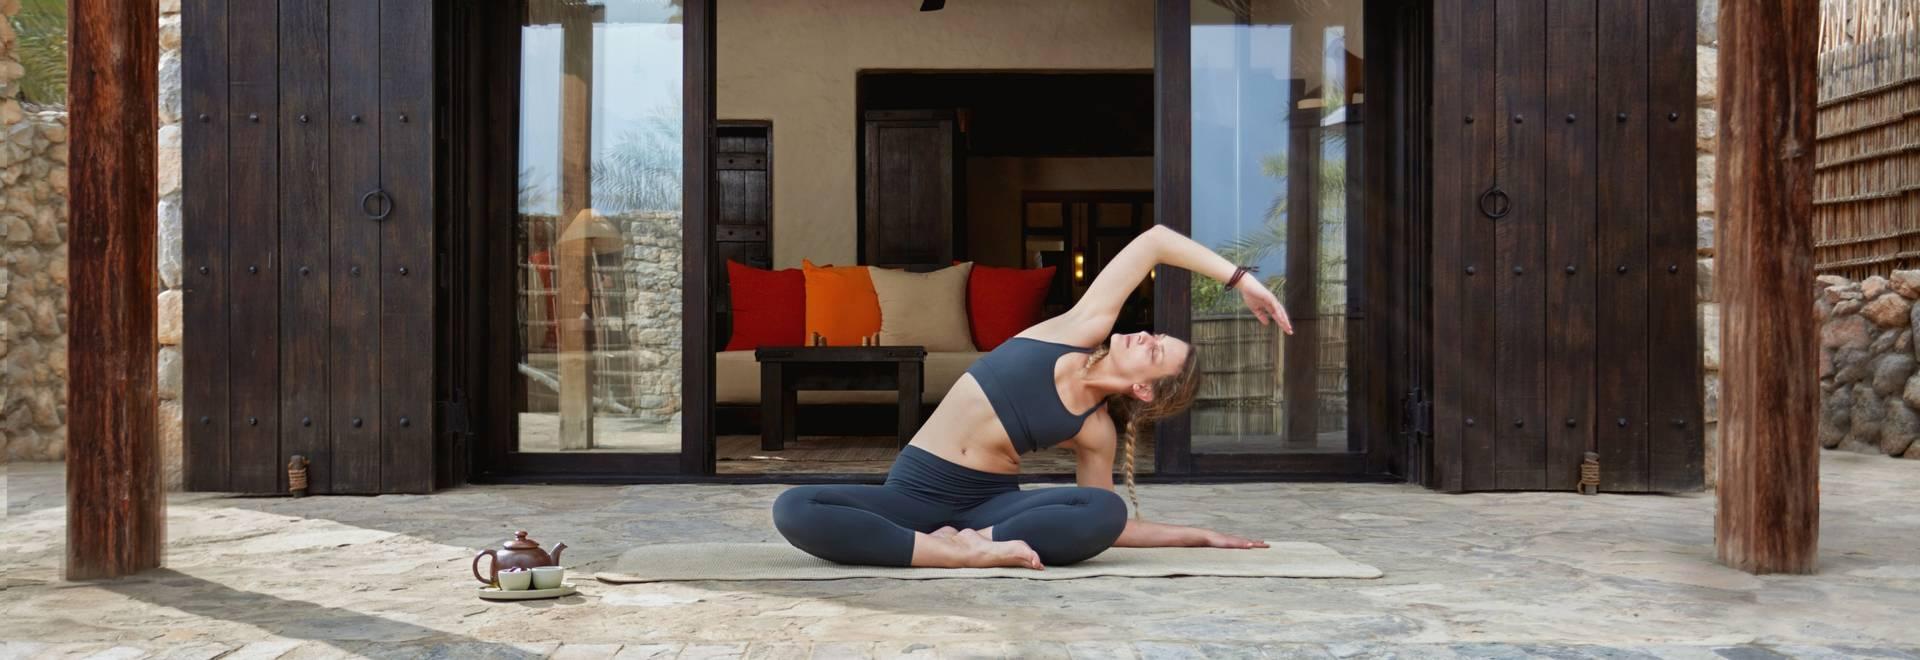 Yoga_in_villa_[6972-A4].jpg